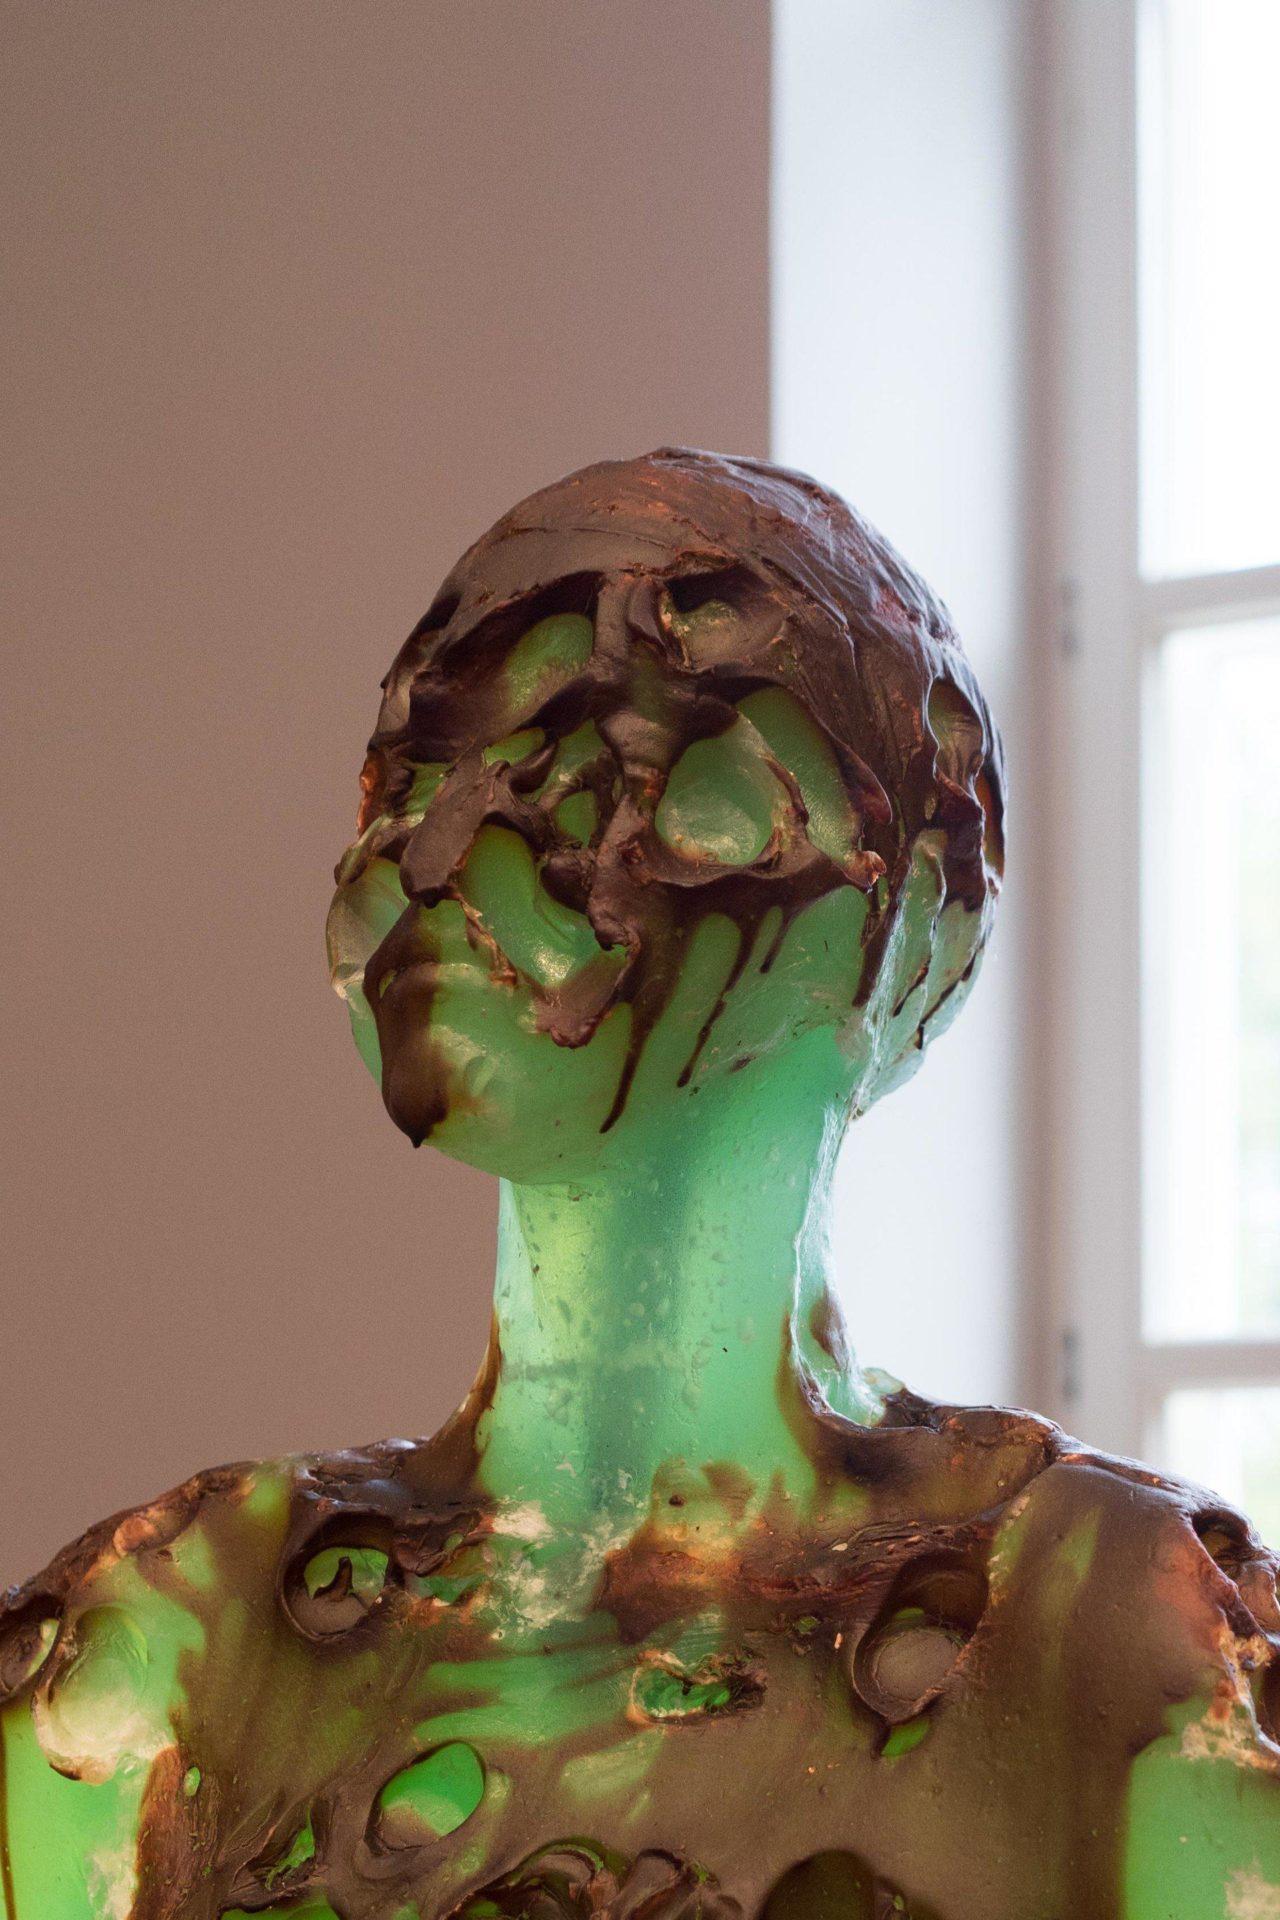 Maria Kulikovska, Homo Bulla, 2015, Detail